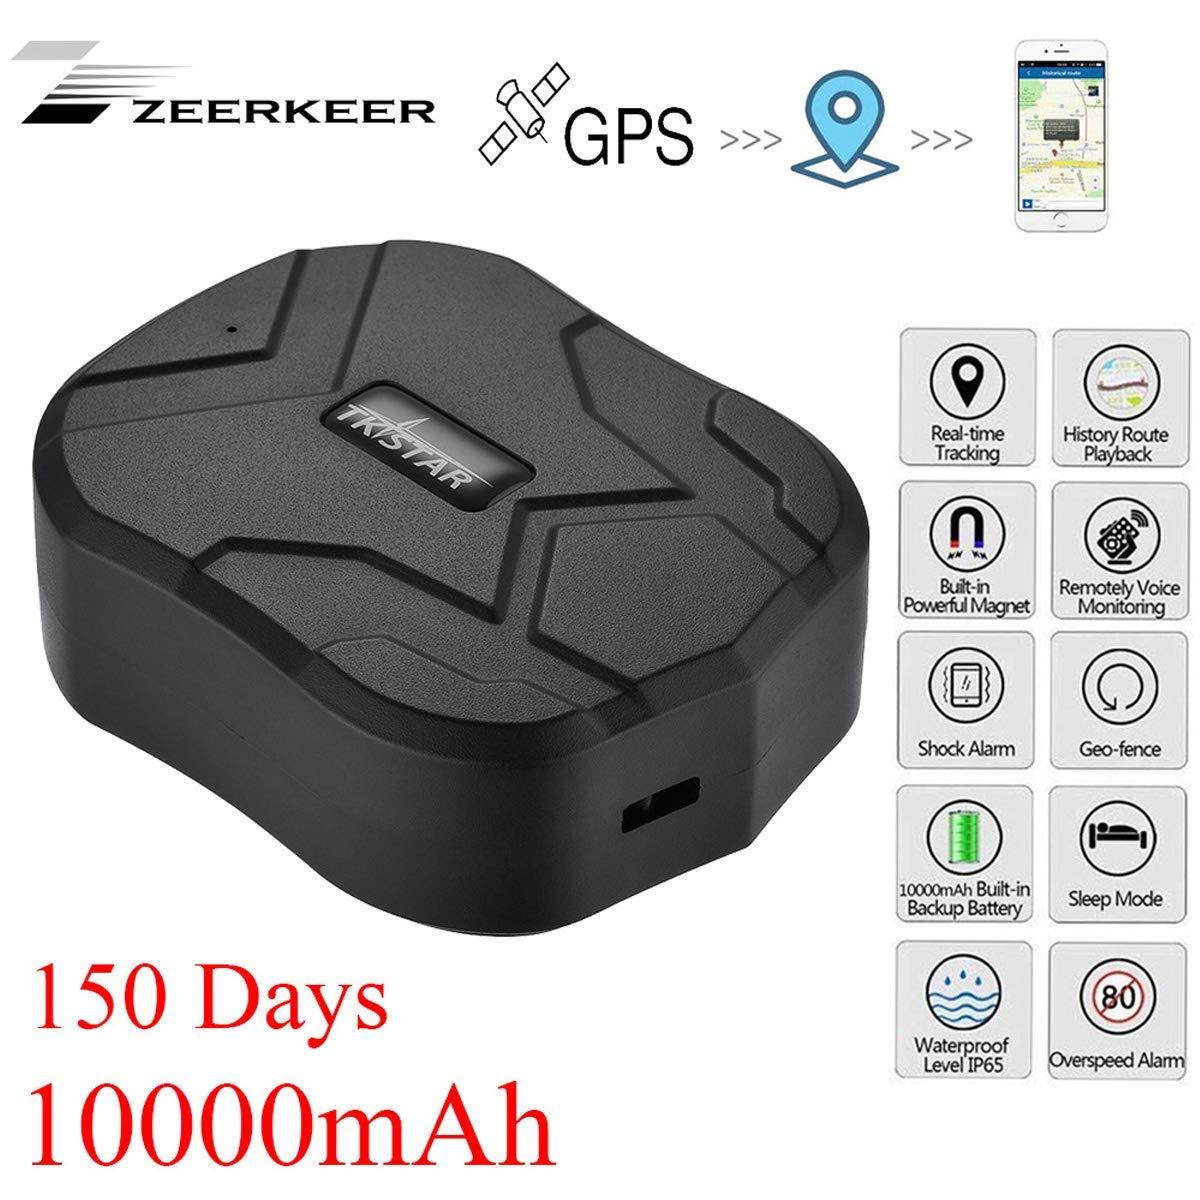 GPS Tracker,10000mAh 150 días de Espera,Seguimiento en Tiempo Real,Magnético Fuerte Rastreador Antirrobo a Prueba de Agua,Localizador de GPS para ...